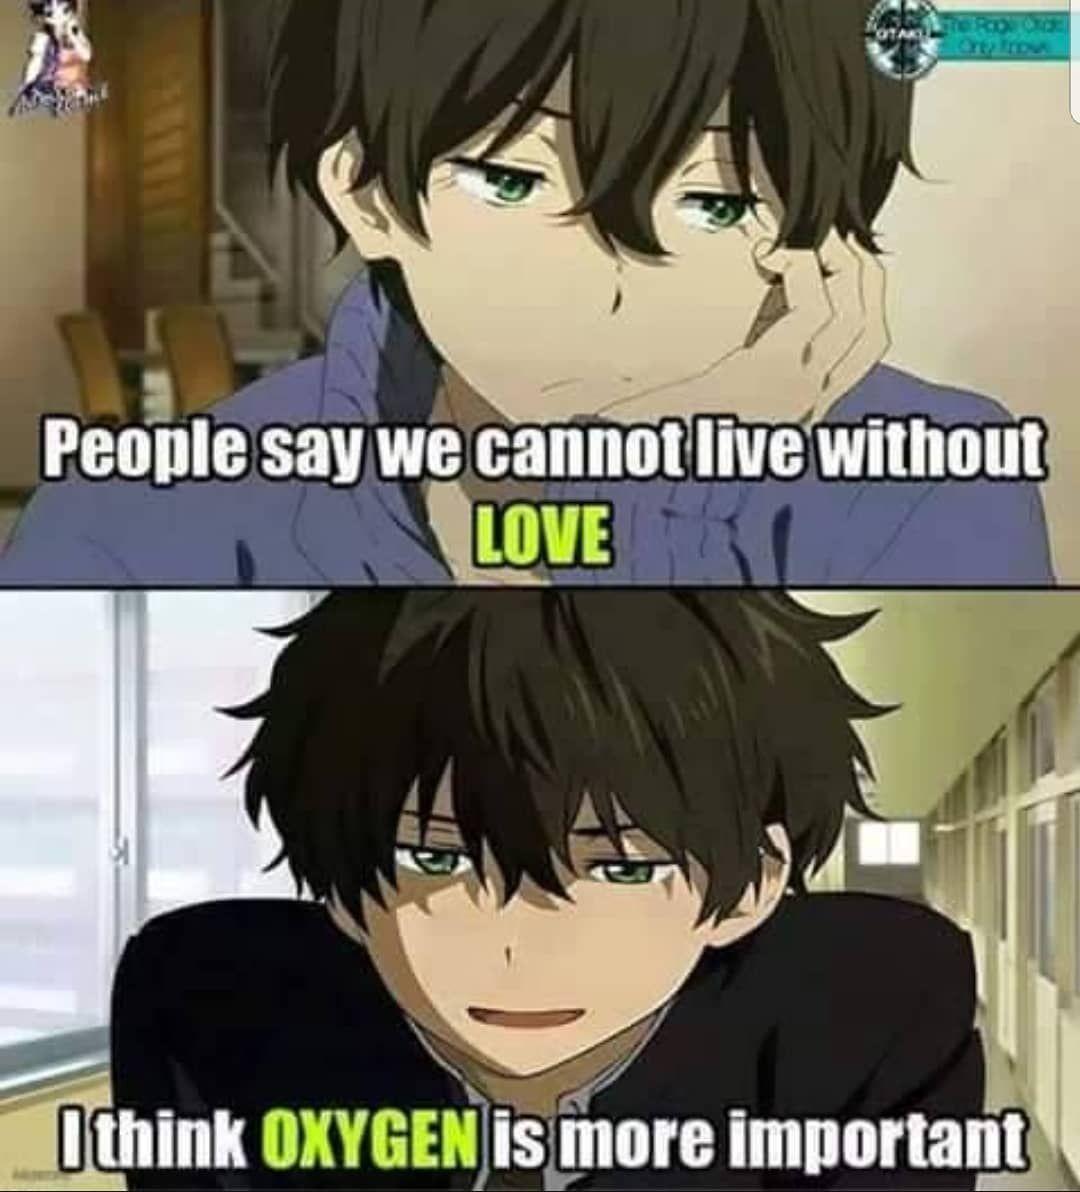 _feels_bad idek \_(ツ)_/ #anime #animememes #weeb #otaku # ...